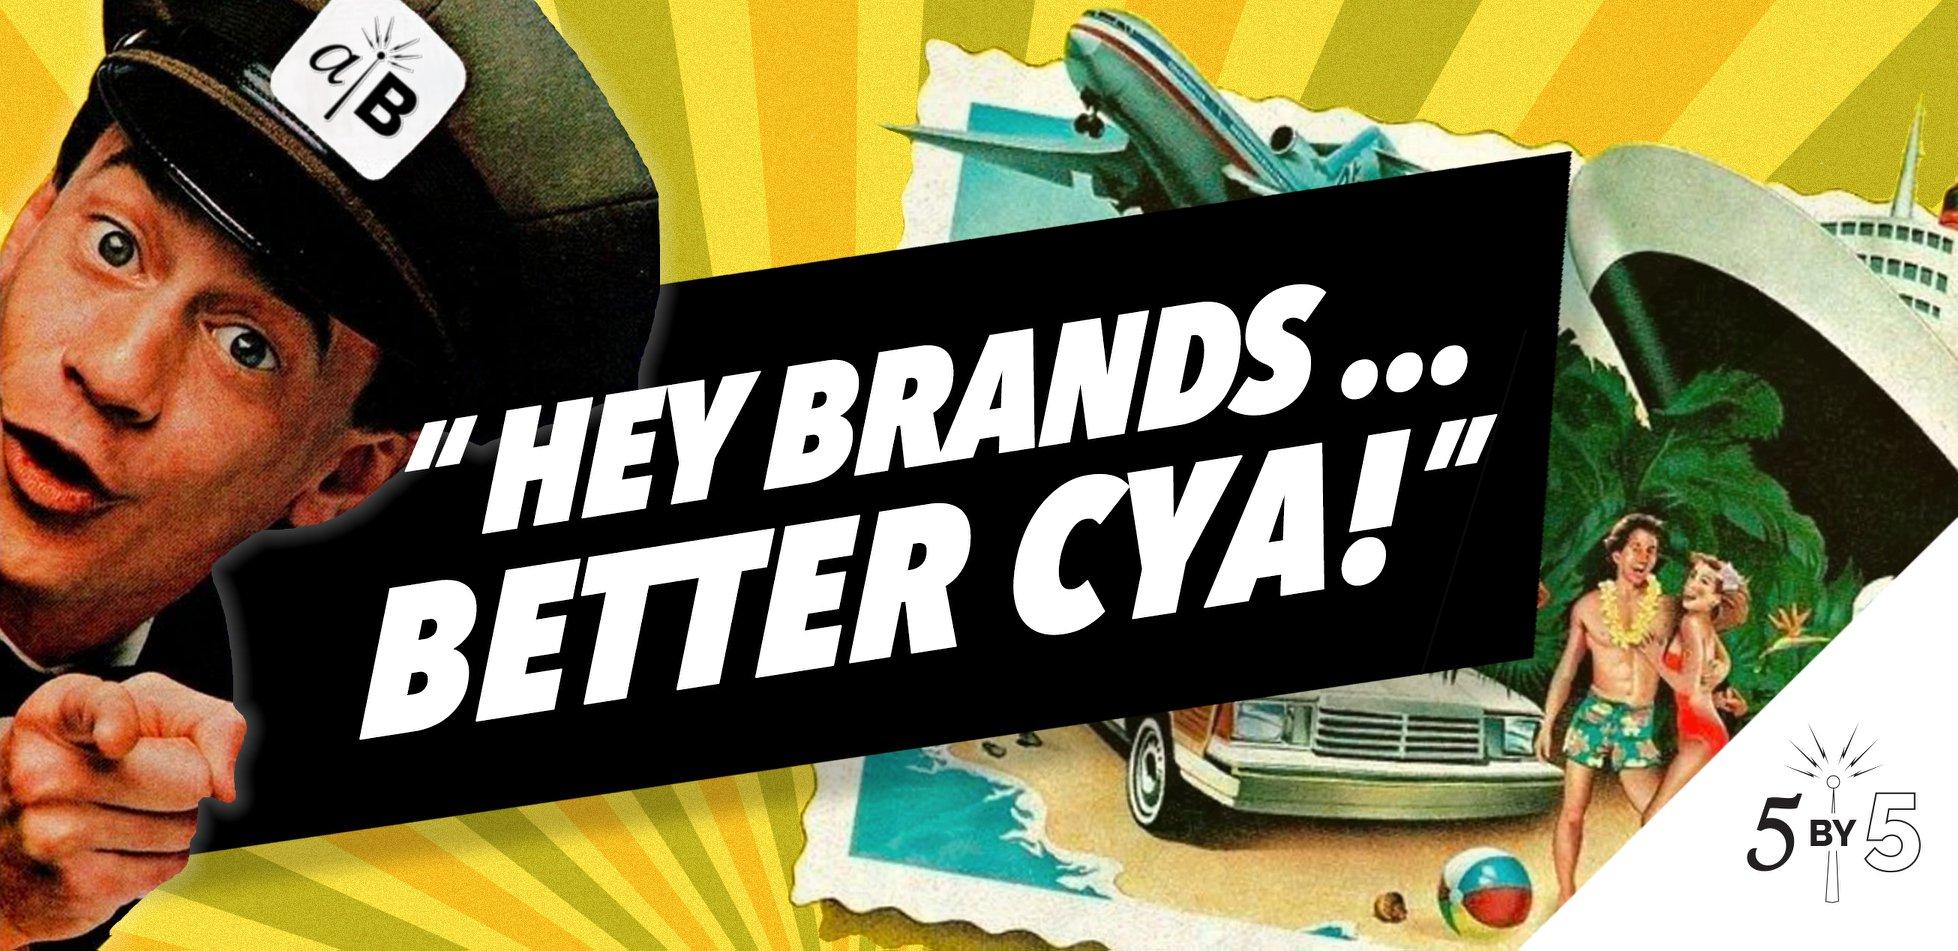 vintage poster 'hey brands...better CYA!'